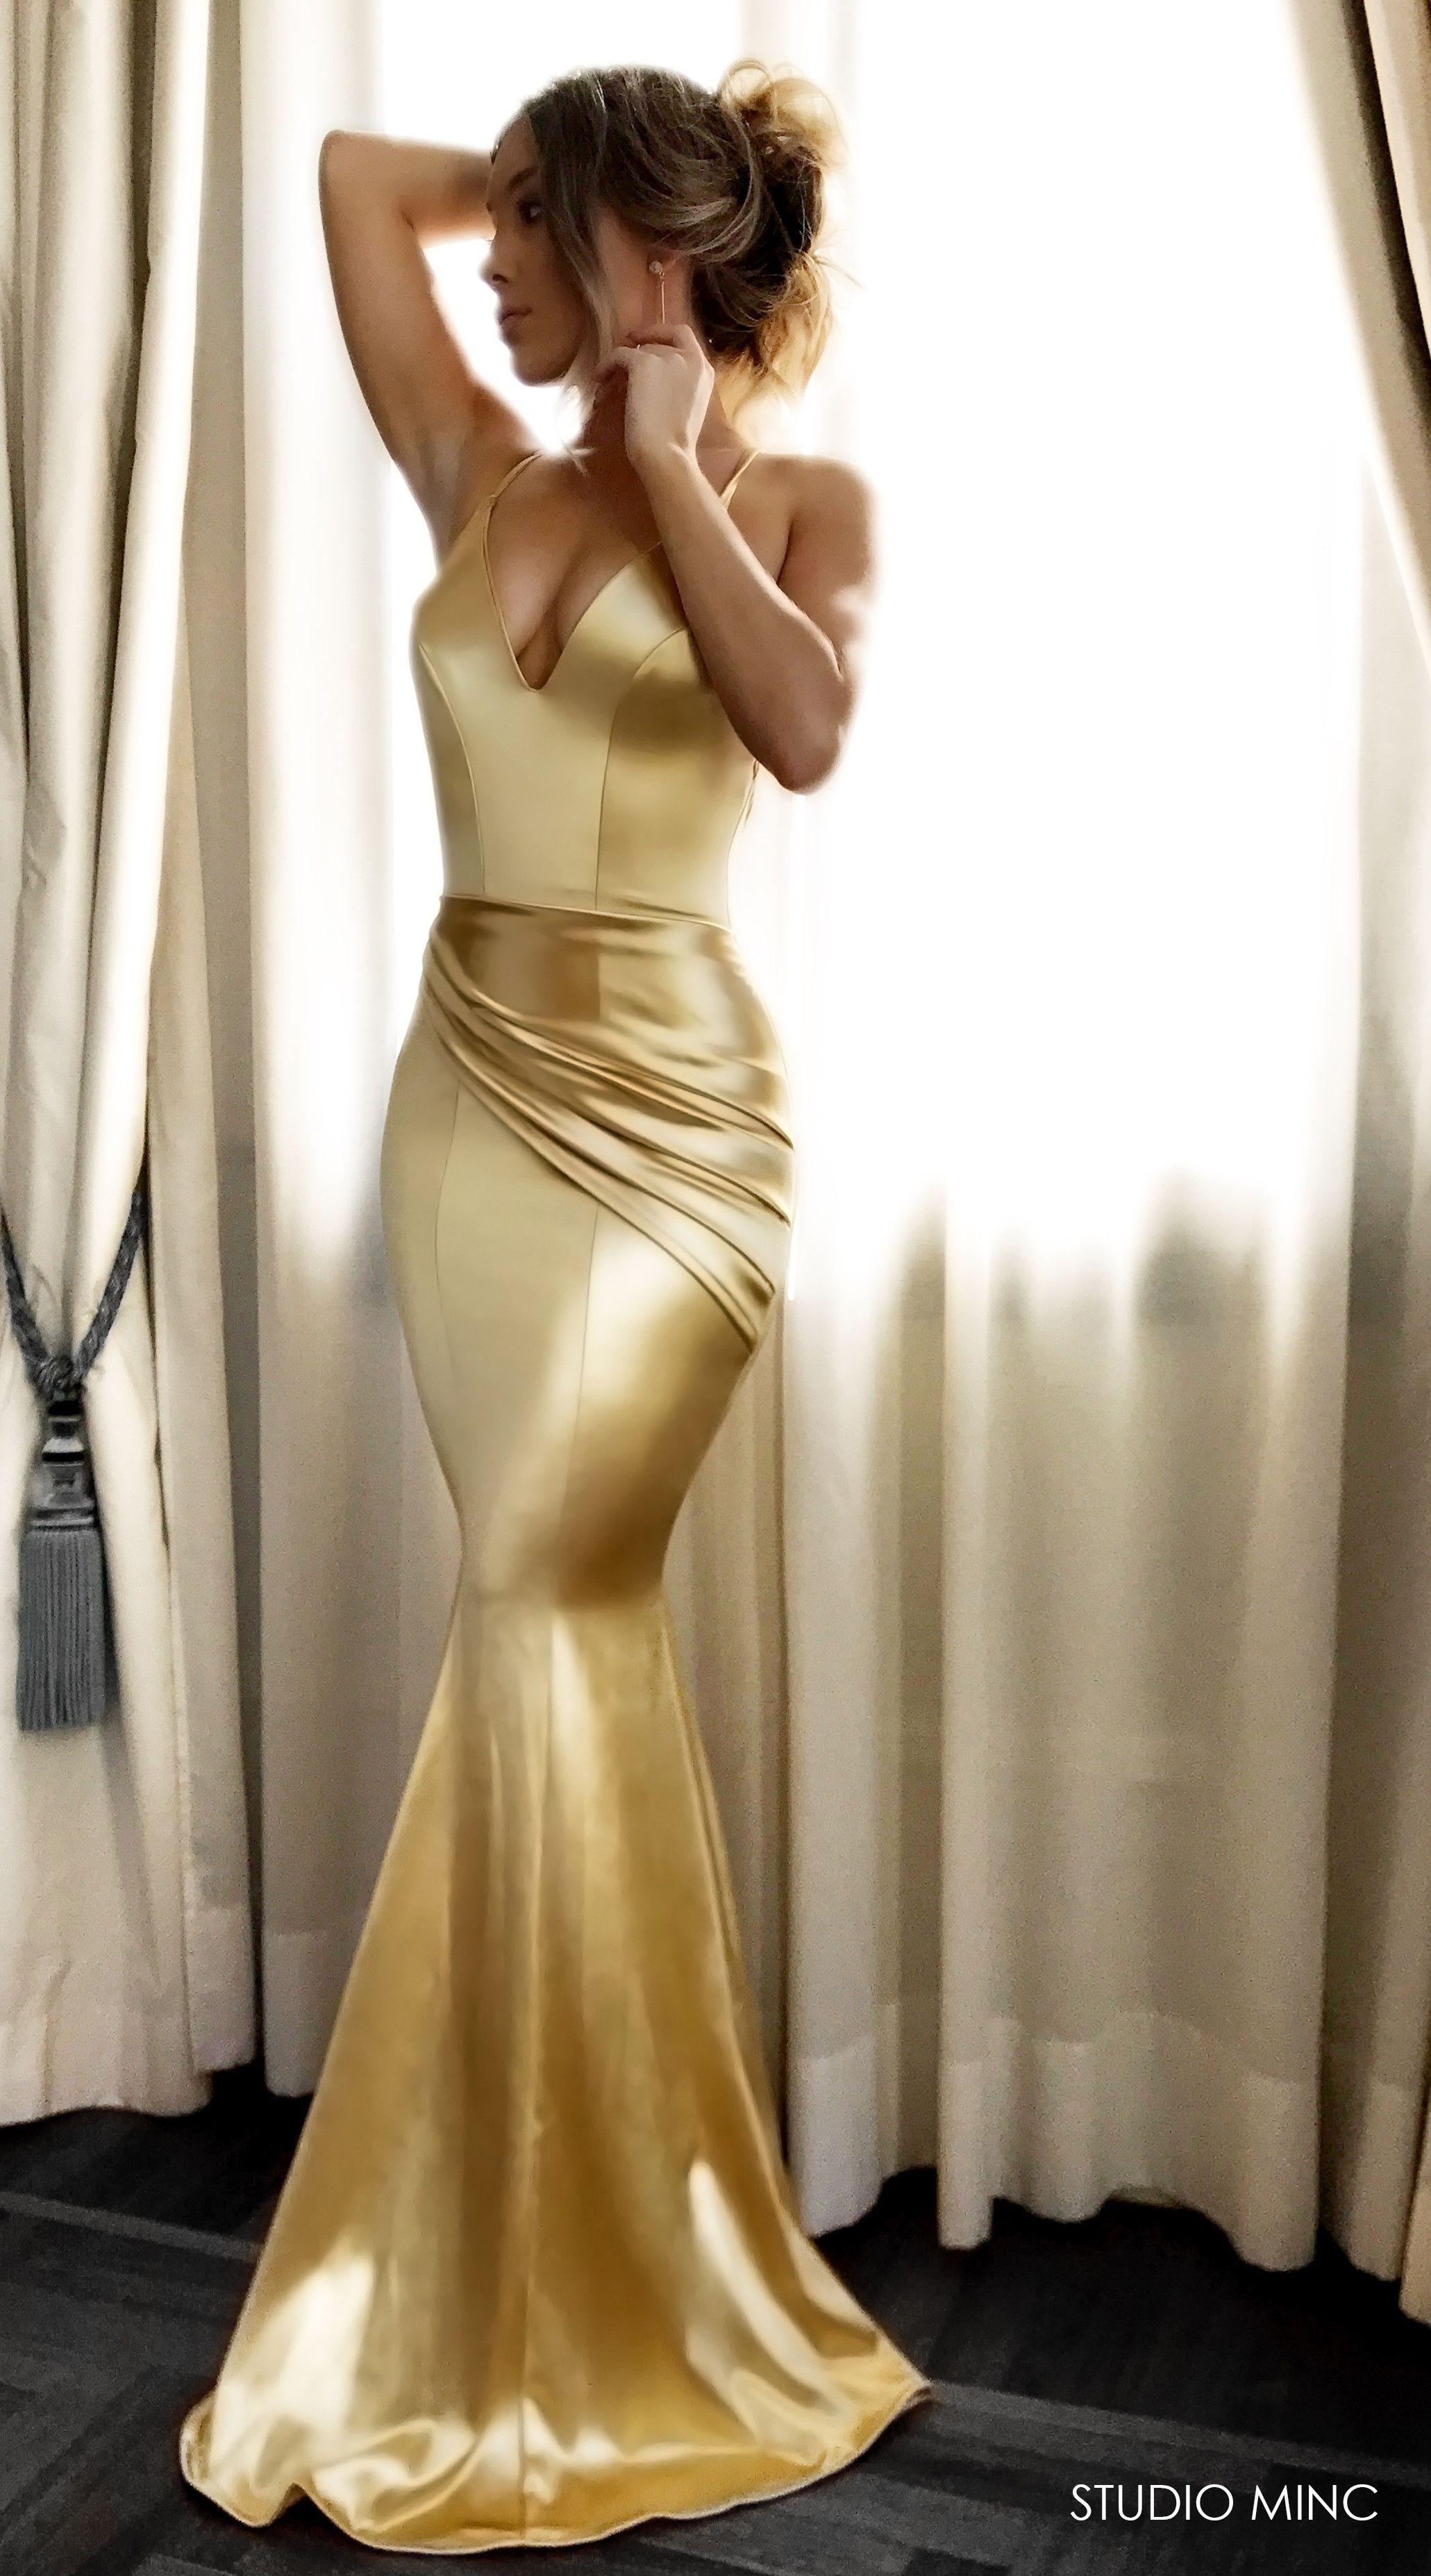 Gold Satin Spell Dress By Studio Minc Formal Prom Backless Dress Mermaid Prom Dresses Backless Prom Dresses Dresses [ 3709 x 2061 Pixel ]